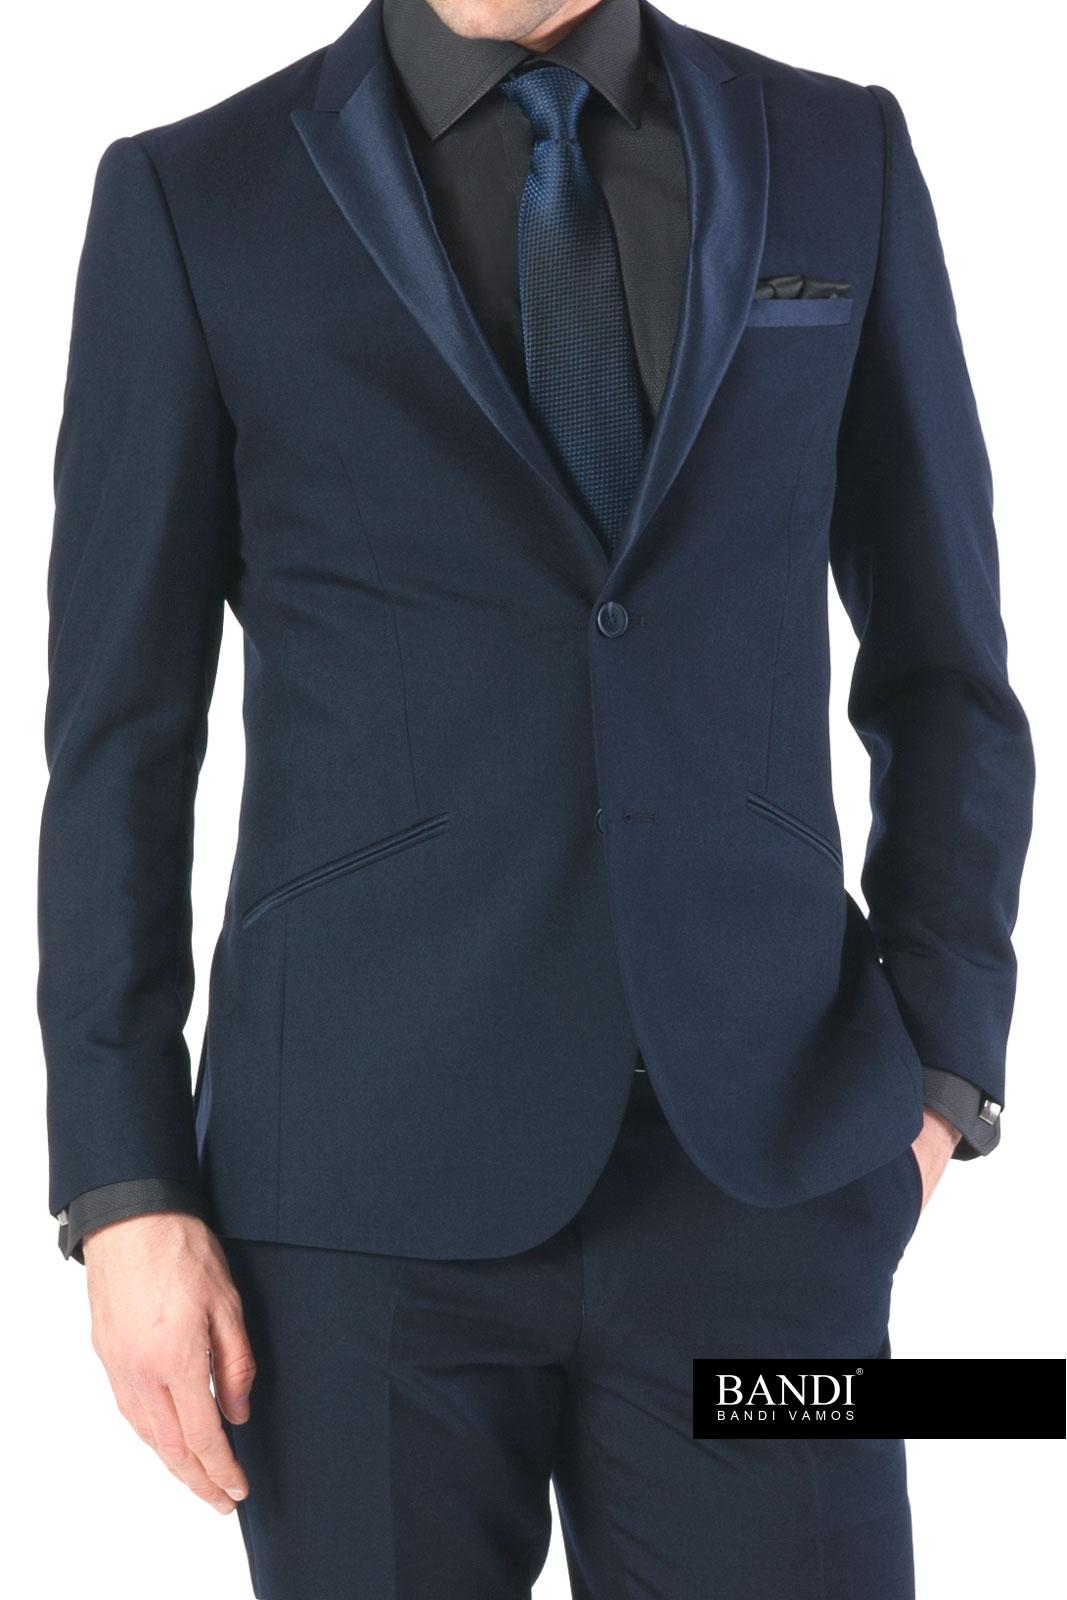 Příklad outfitu na ples – modrá lesklá kravata